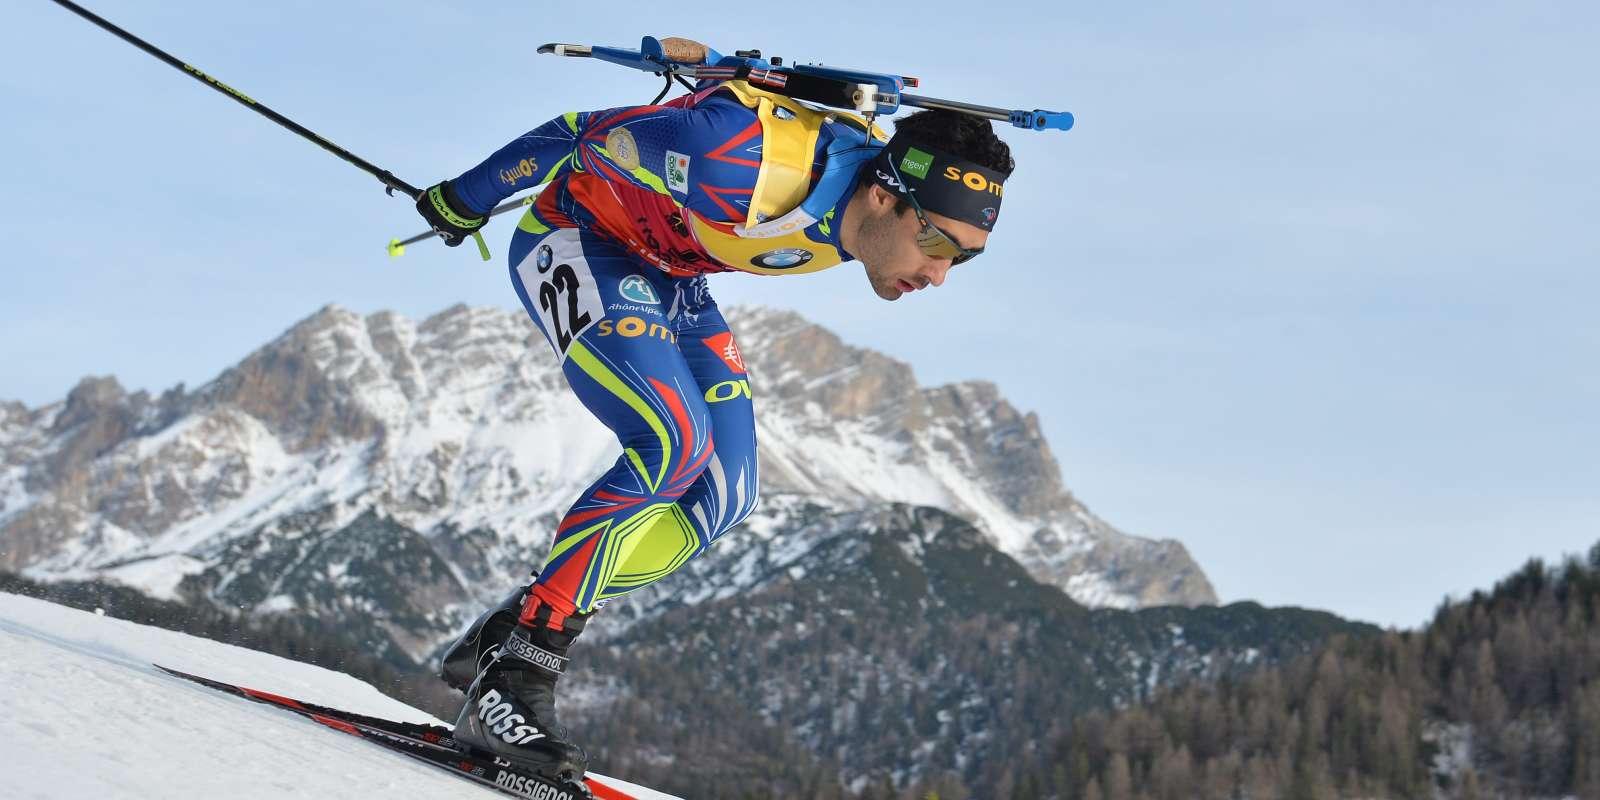 Calendrier Coupe Du Monde Biathlon 2020.Biathlon En Direct Revenu De Loin Martin Fourcade Termine